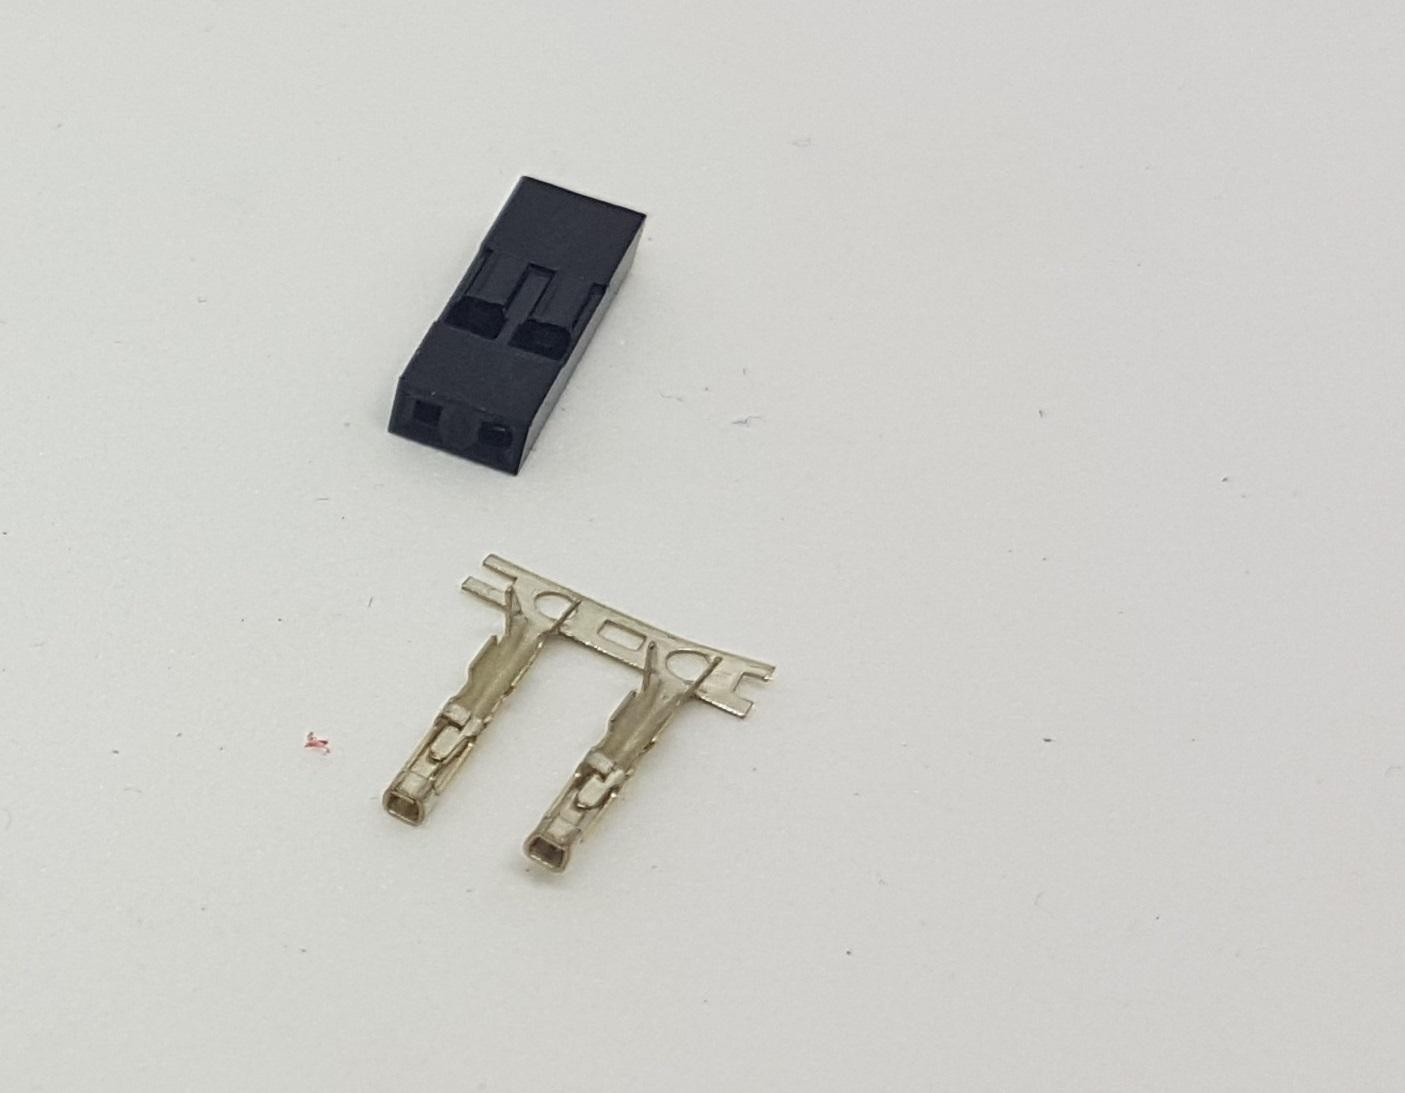 3d drucker teile und mehr dupont stecker 2 pol. Black Bedroom Furniture Sets. Home Design Ideas